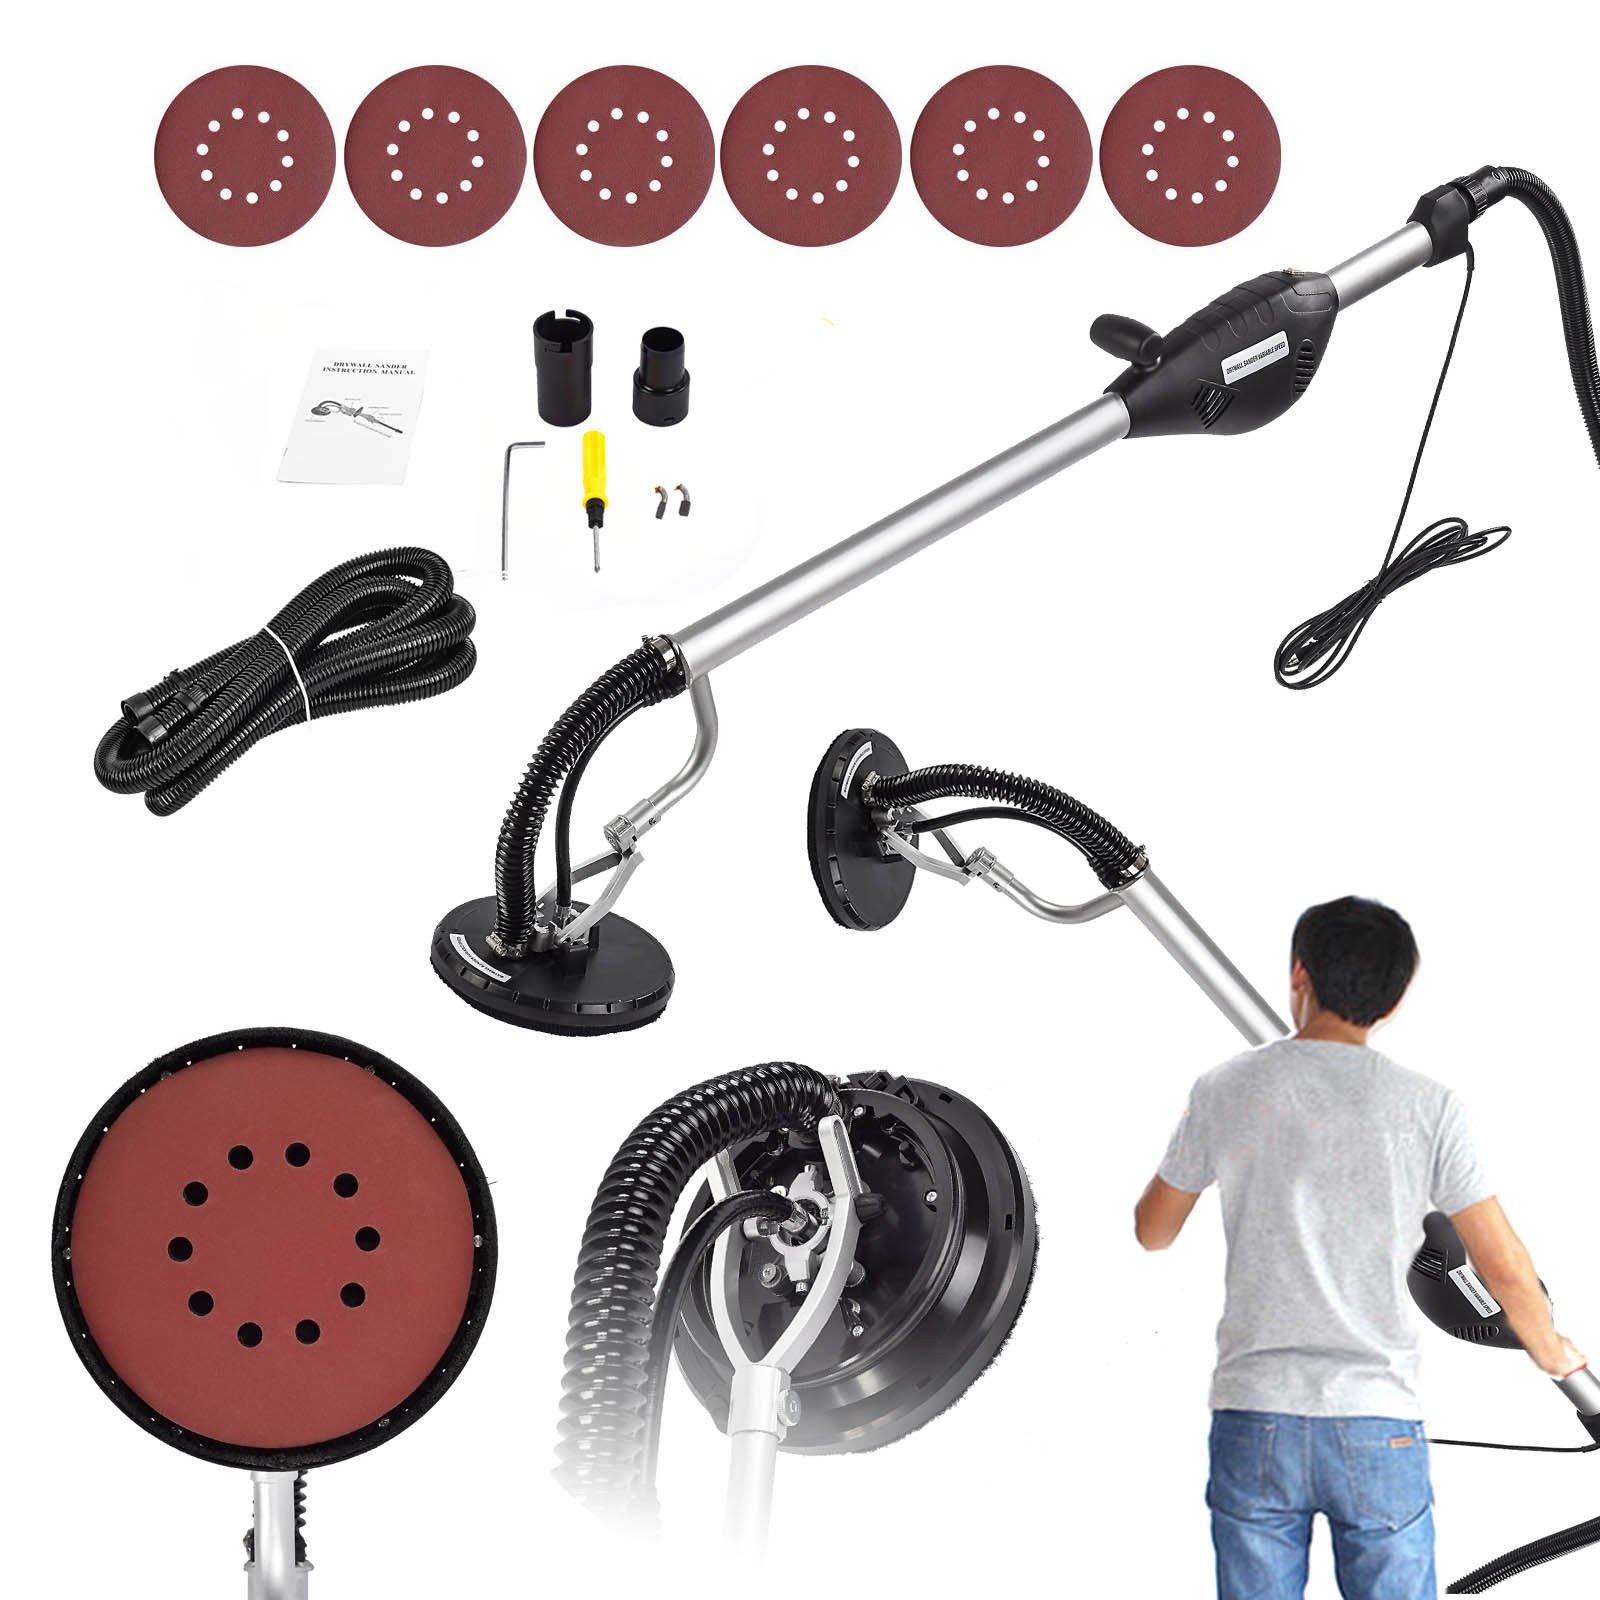 SUNCOO Commerical Drywall Sander Electric Disc Sanding Pole 6 Speed, 6 Sanding Discs 800W Black